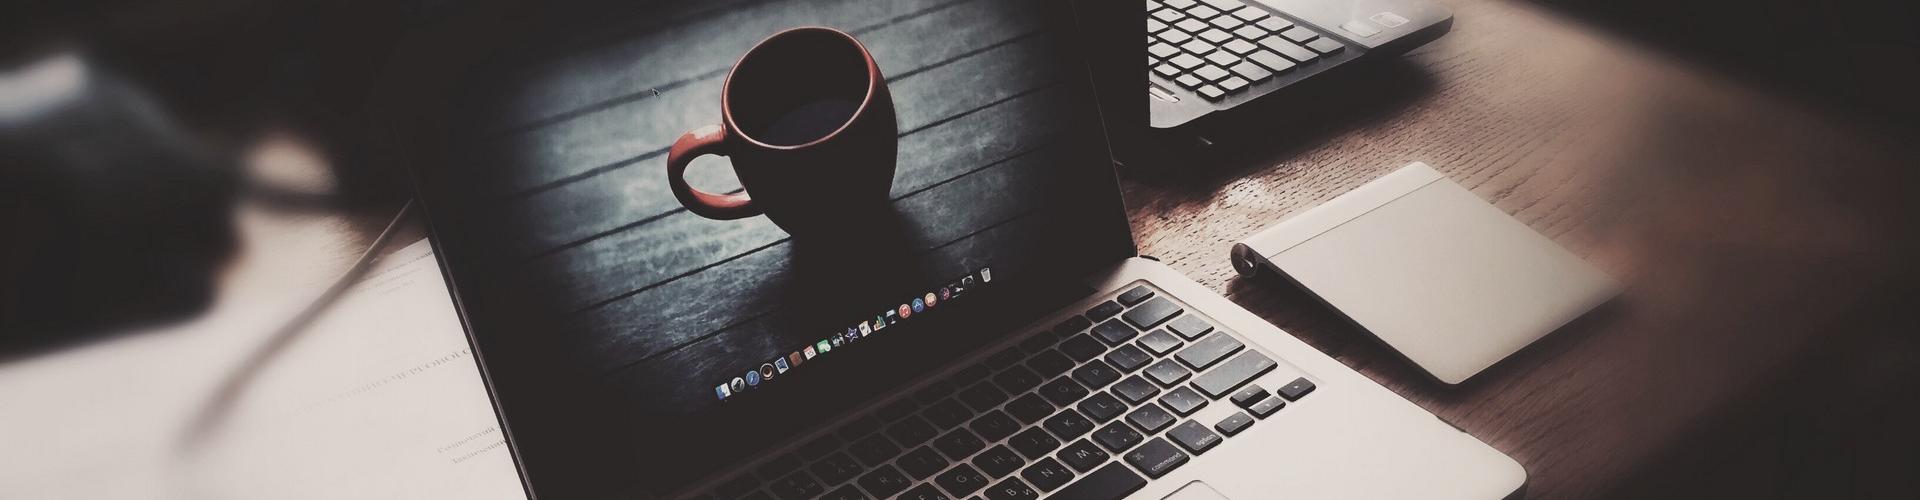 Directory Lister-最简洁目录列表程序,优秀的在线文件管理器